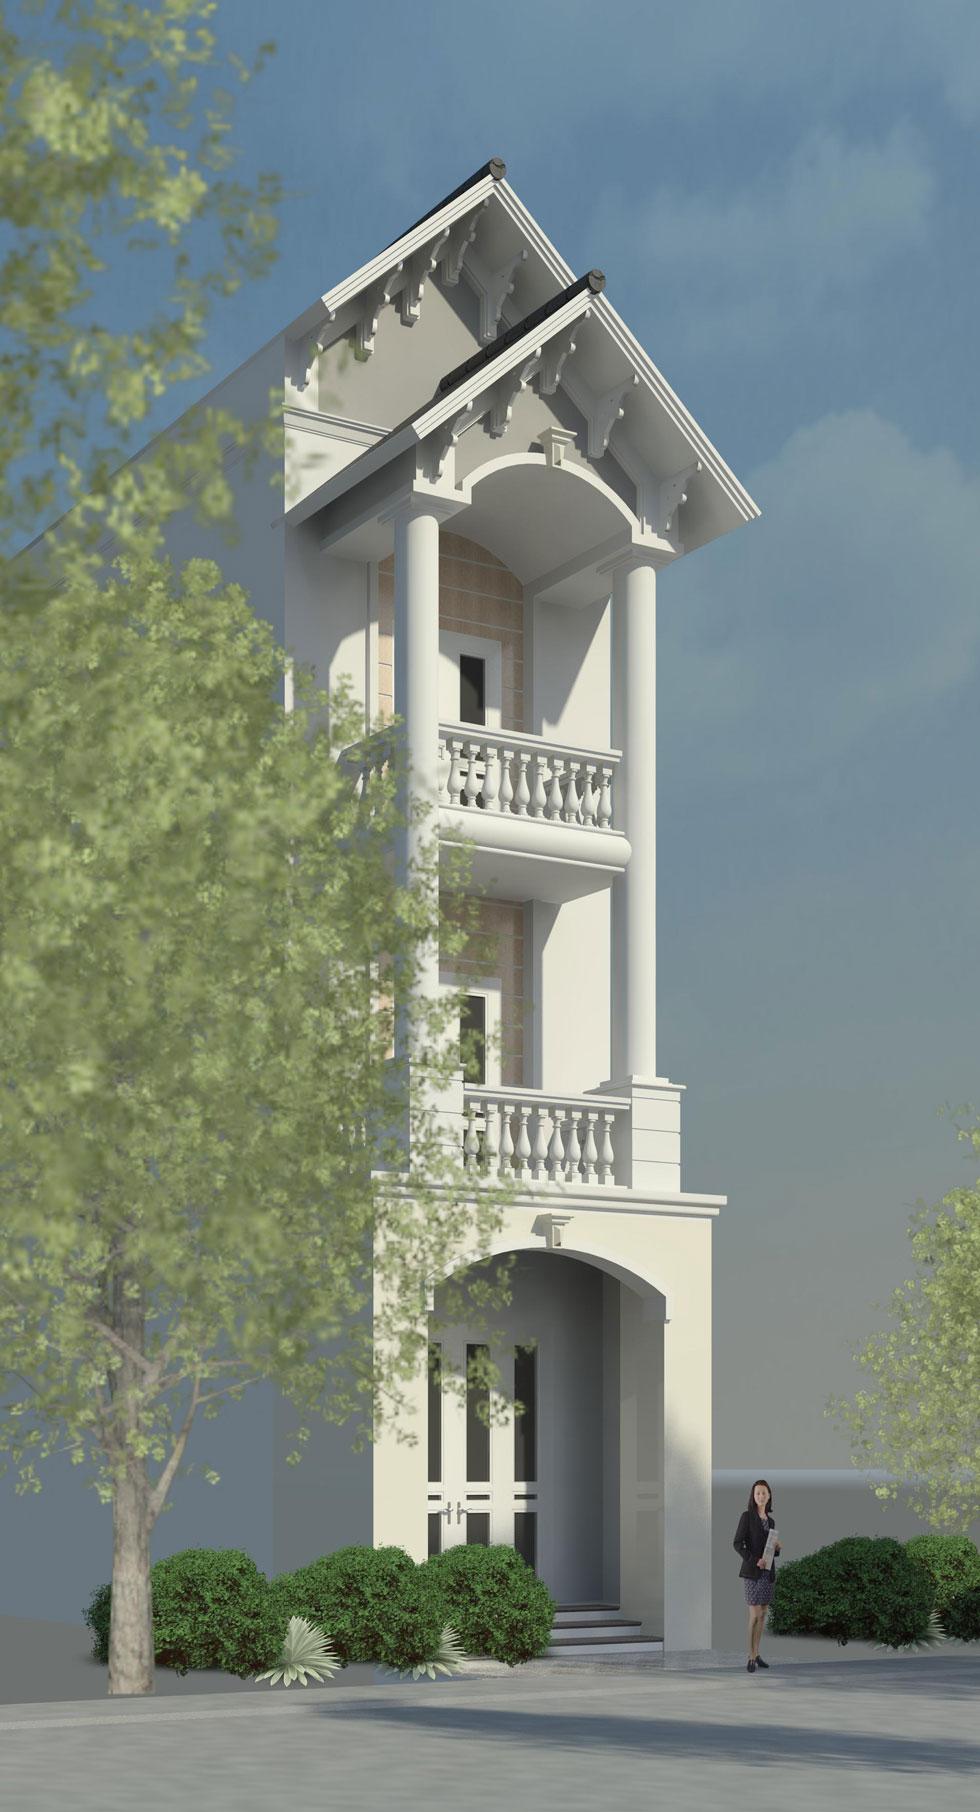 Kiến trúc ngoại thất 1